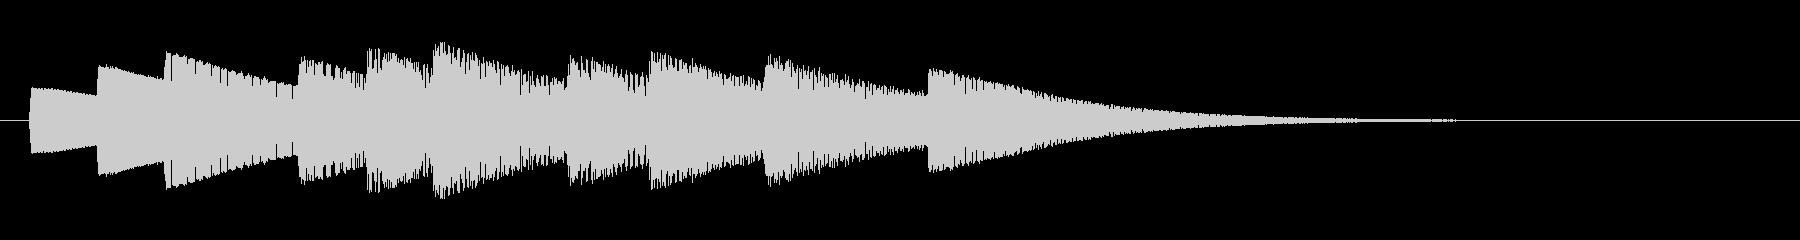 KANT入店音ジングル010143の未再生の波形